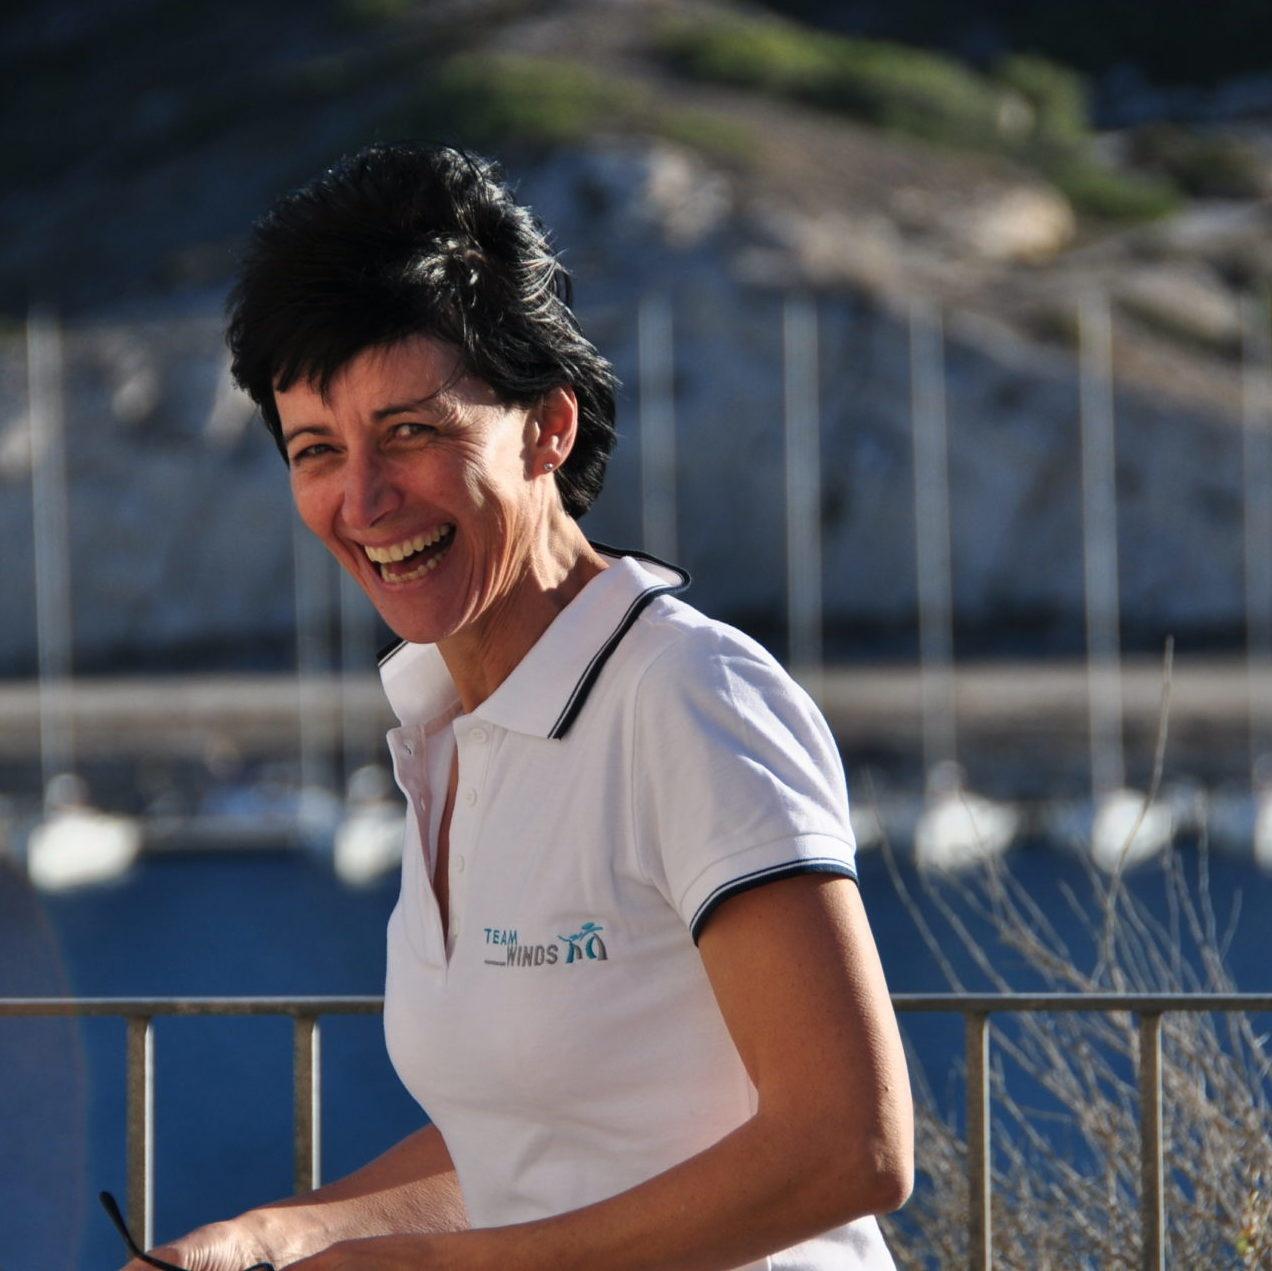 Valérie Cagnat - Team Winds